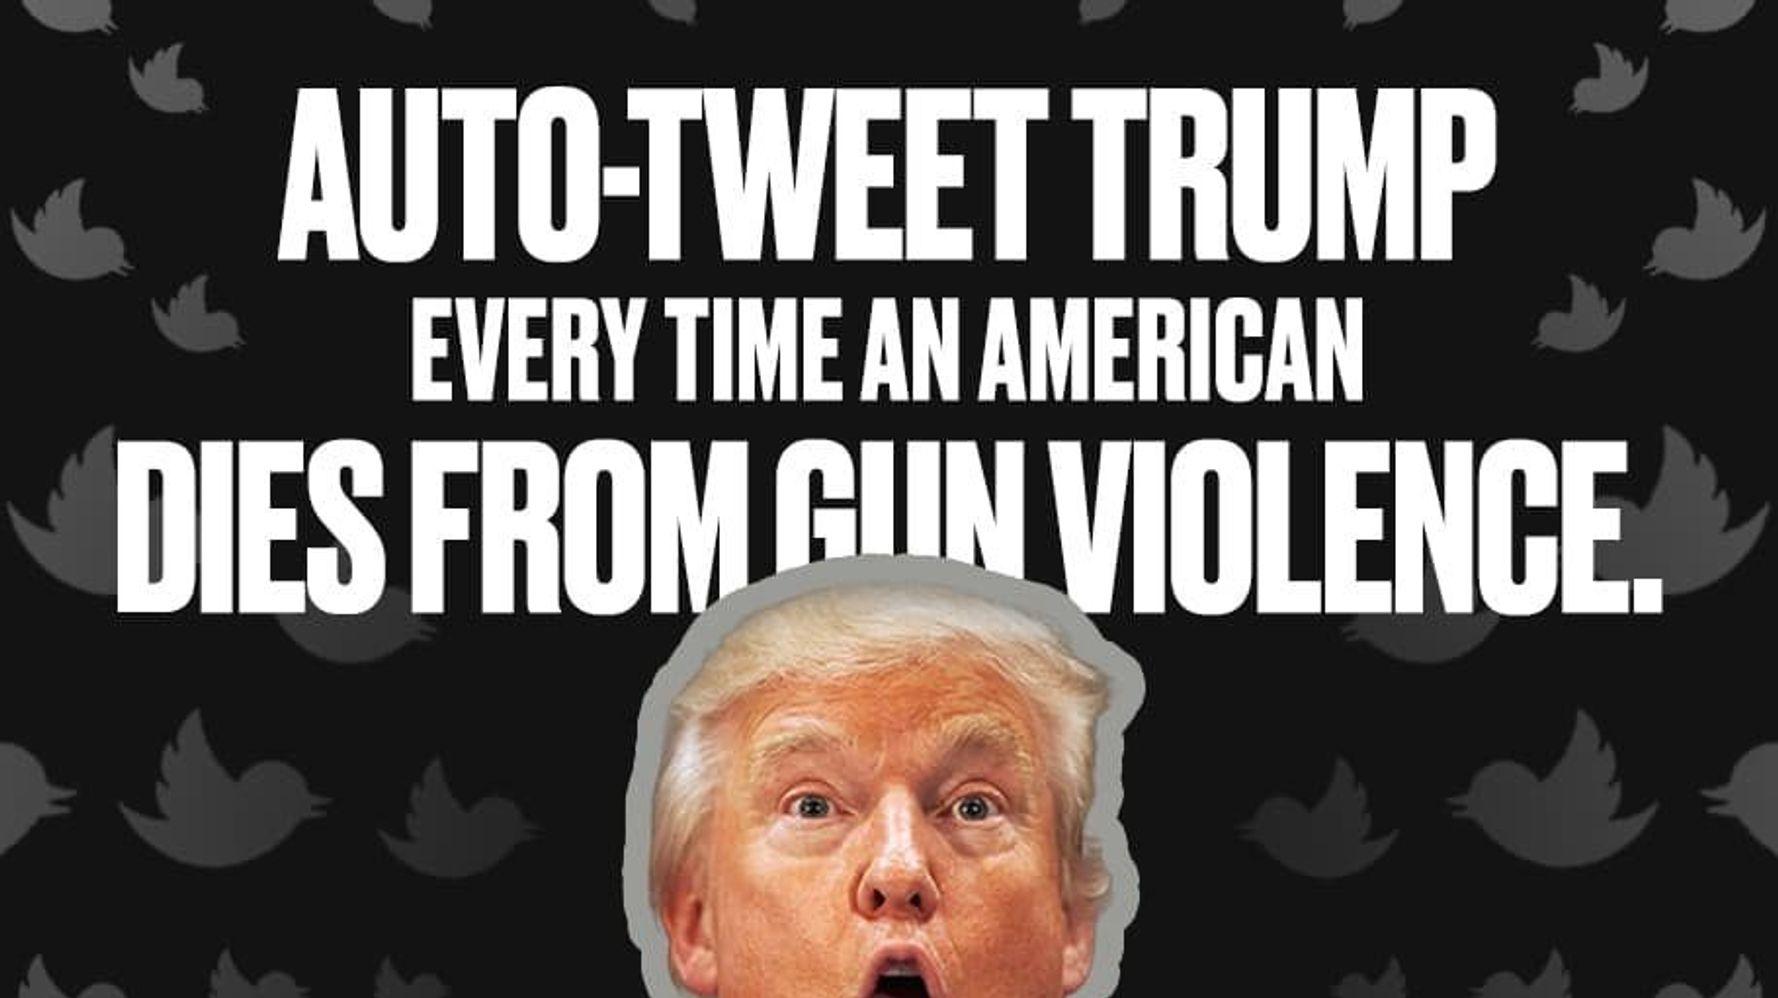 #BackfireTrump Will Tweet Every Gun Death At The President